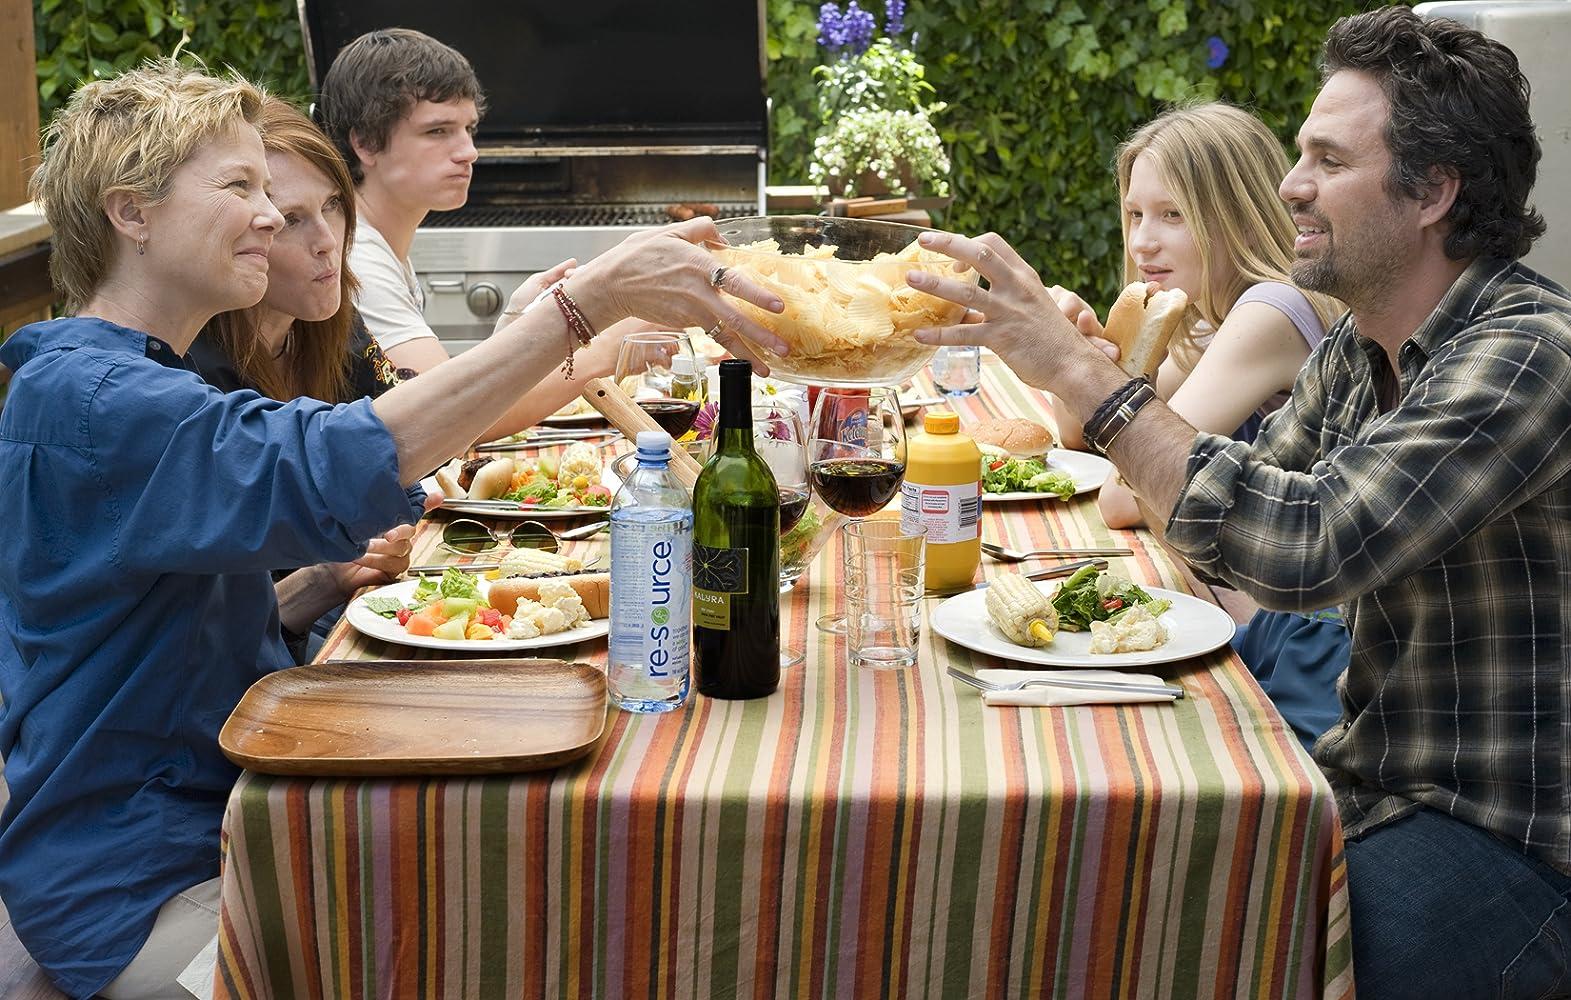 Julianne Moore, Annette Bening, Mark Ruffalo, Josh Hutcherson, and Mia Wasikowska in The Kids Are All Right (2010)